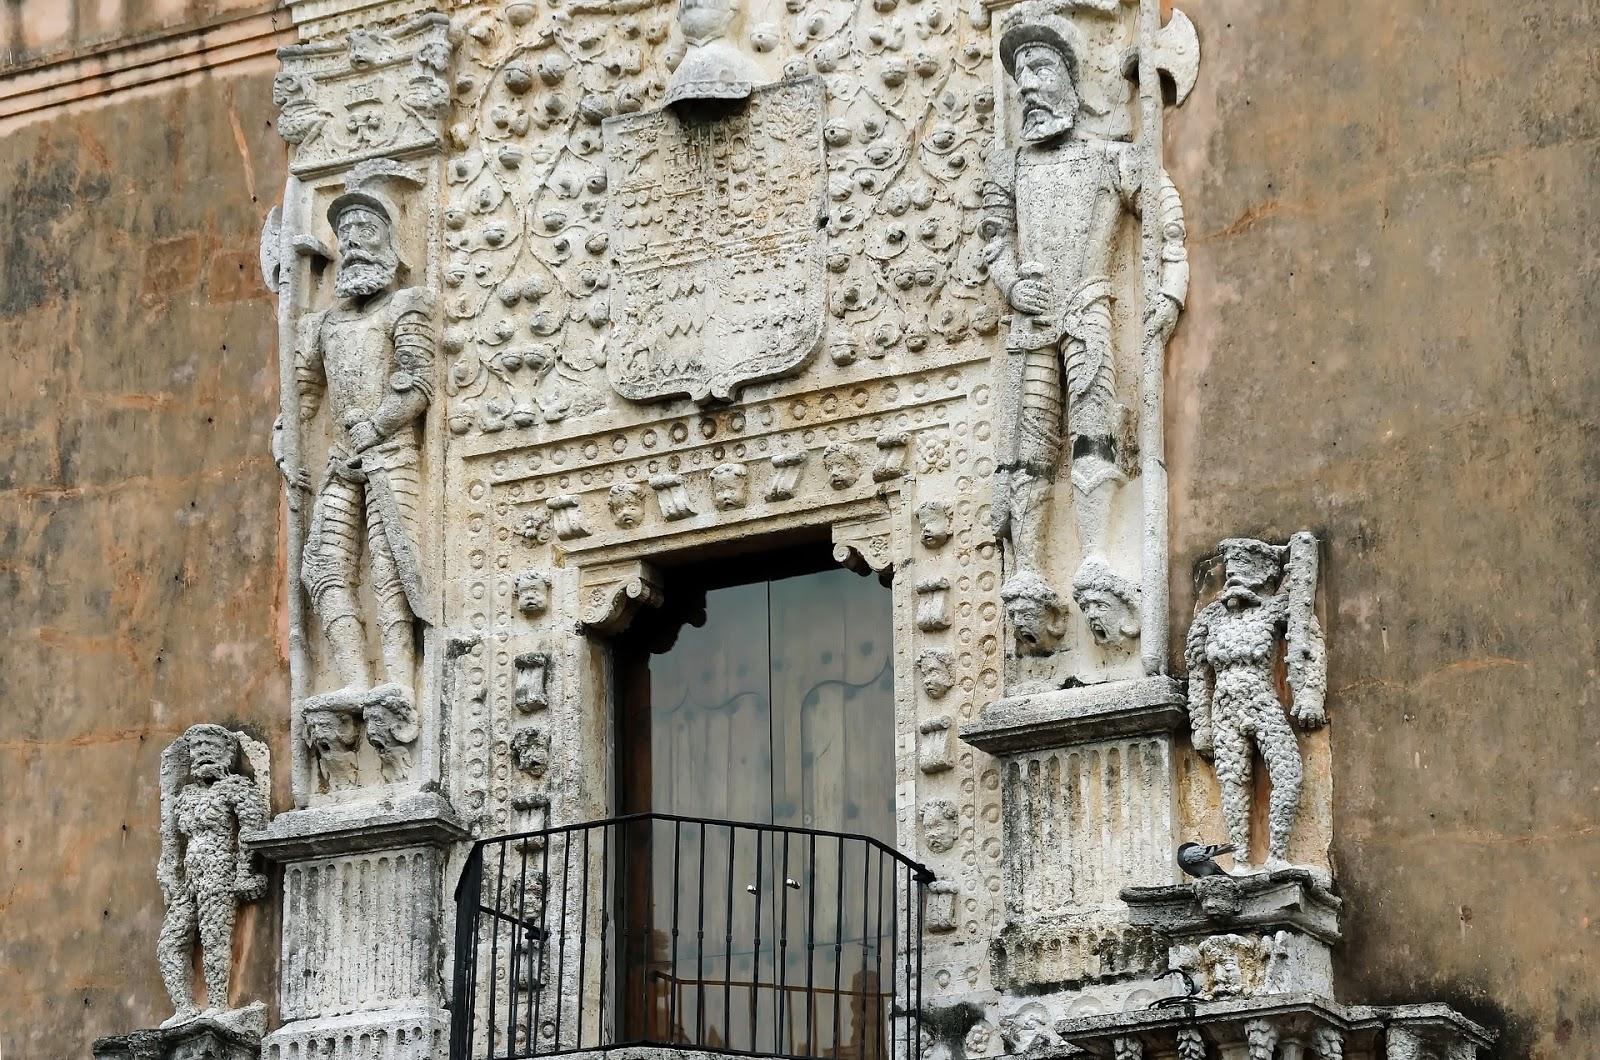 From pixabay https://pixabay.com/photos/mexico-merida-yucatan-cathedral-5055835/